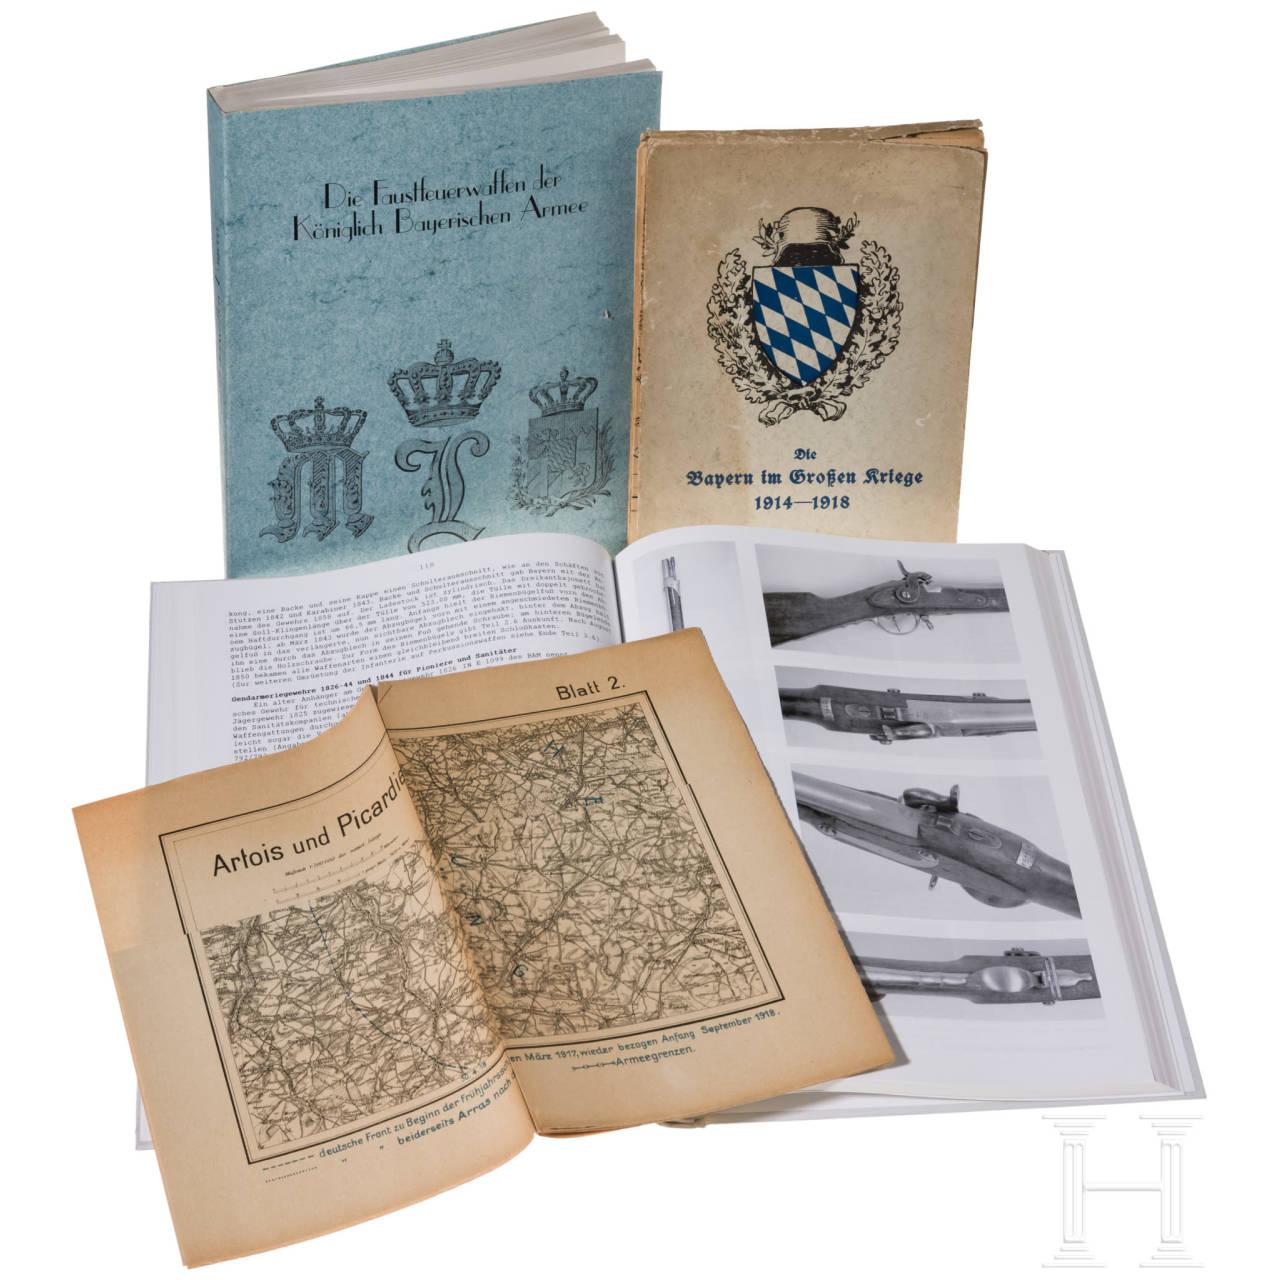 Three Bavarian military books